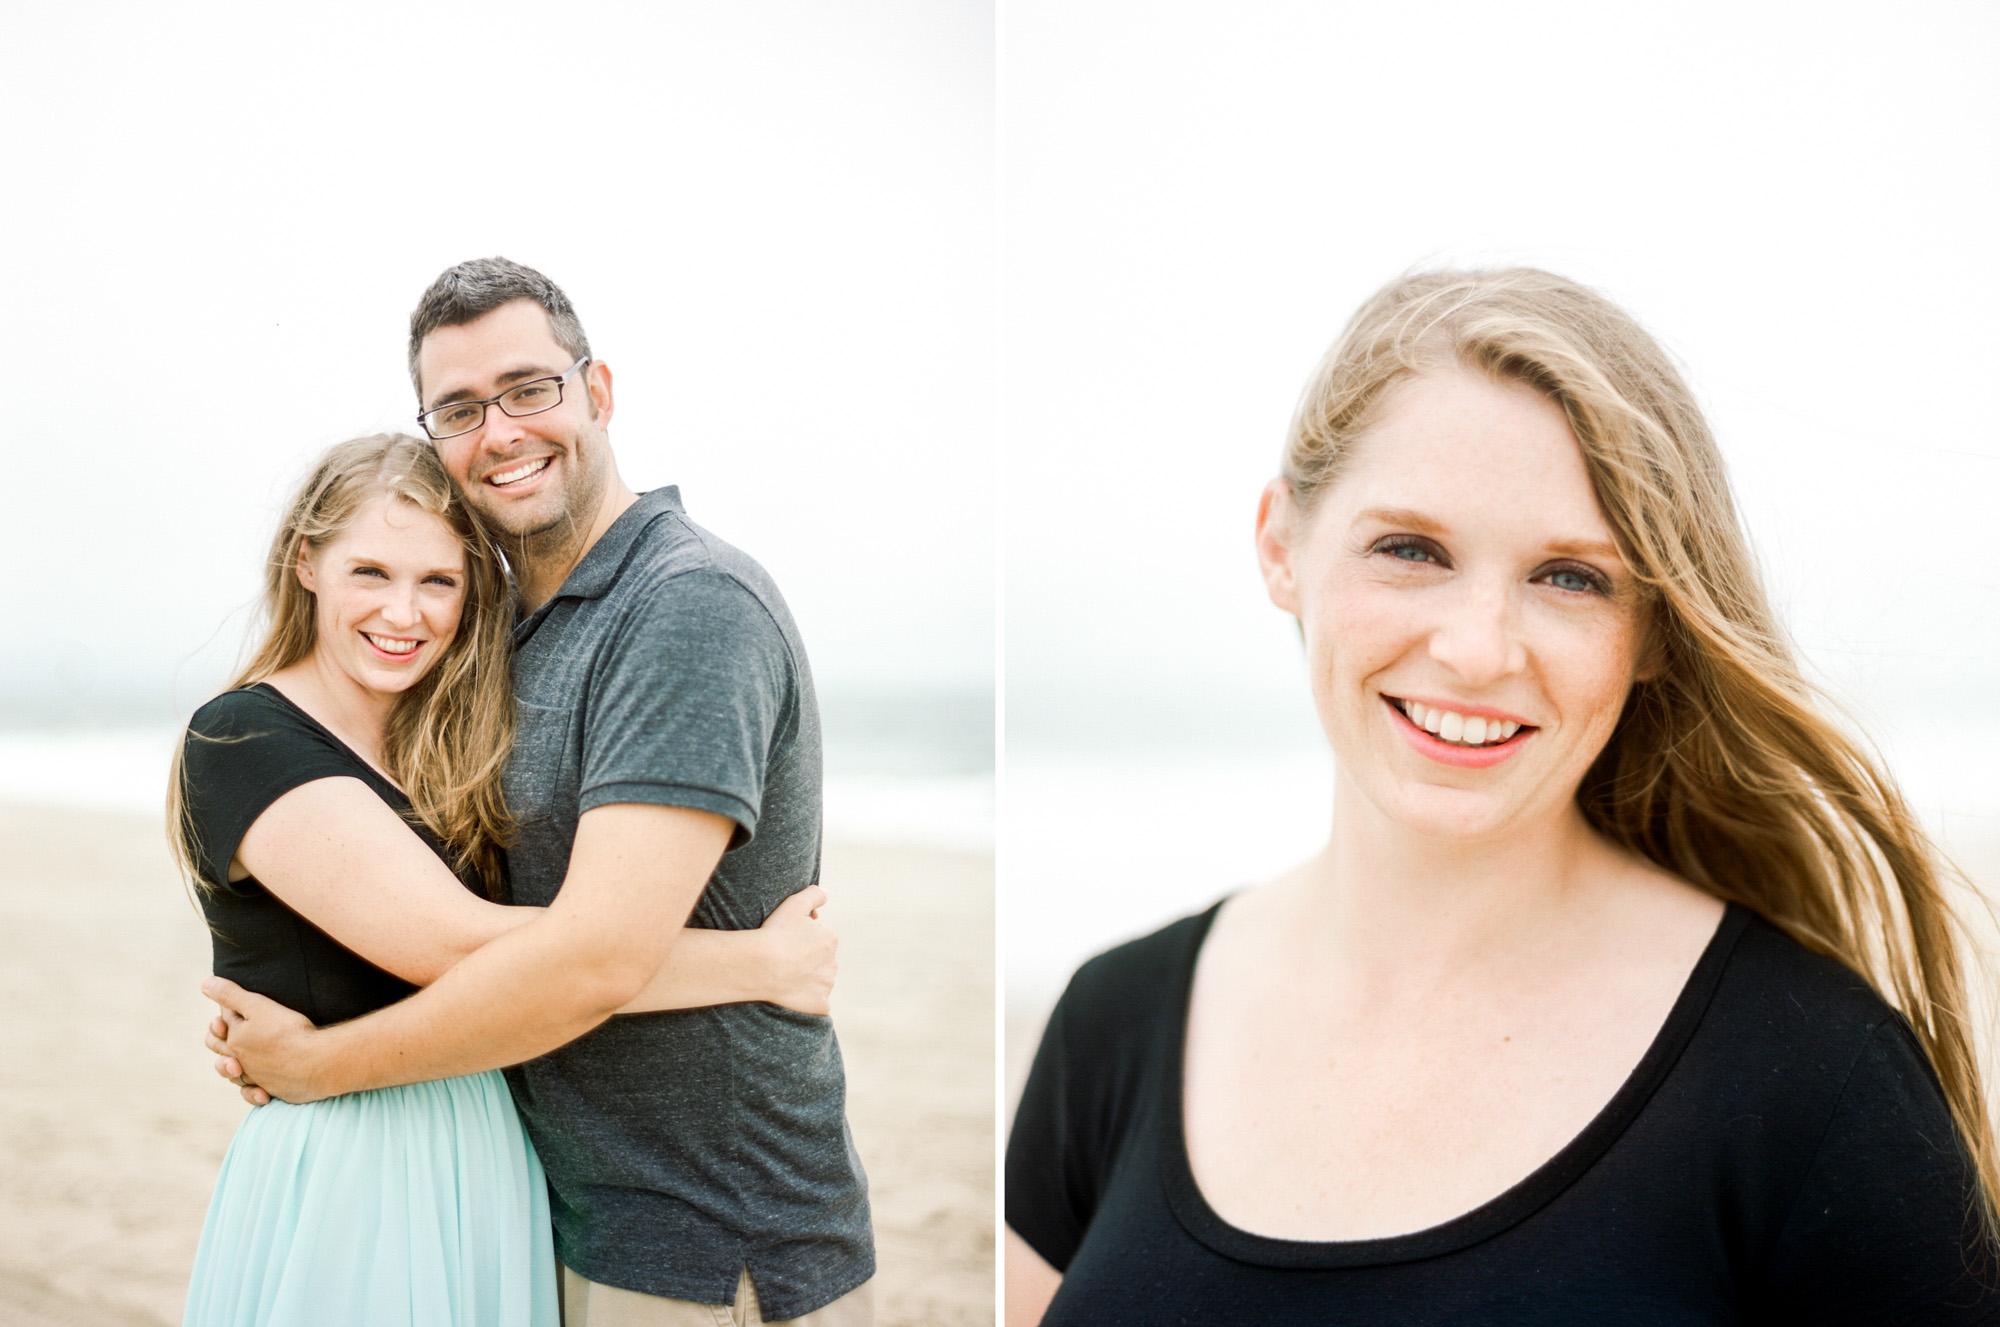 Bethany Beach Family Wedding Photographer-1-2.jpg